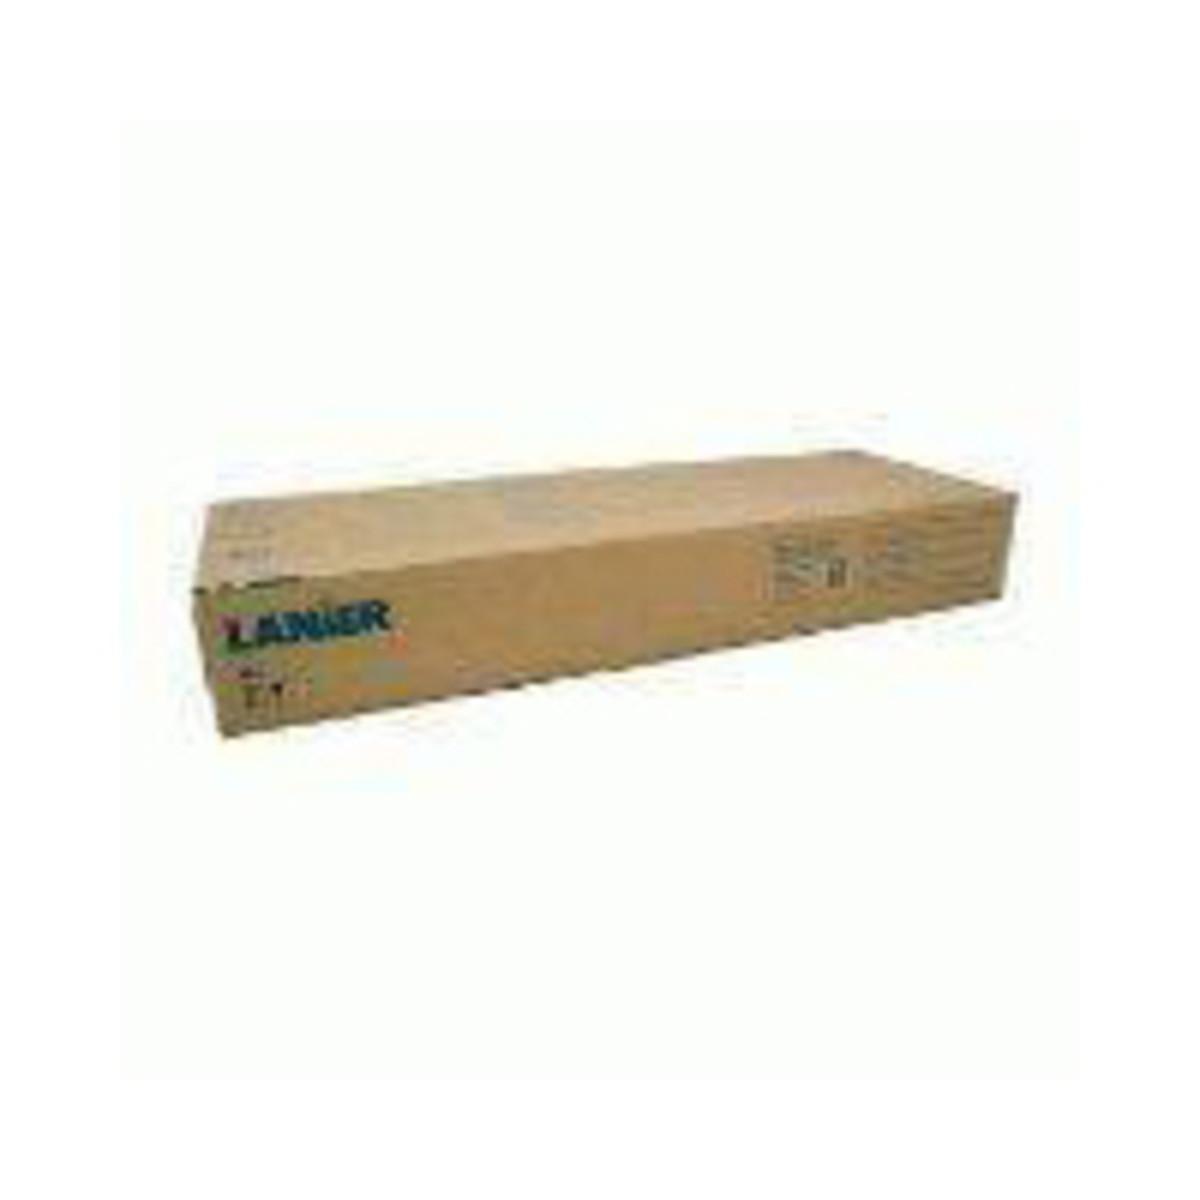 Lanier 888-339 Cyan Toner Cartridge